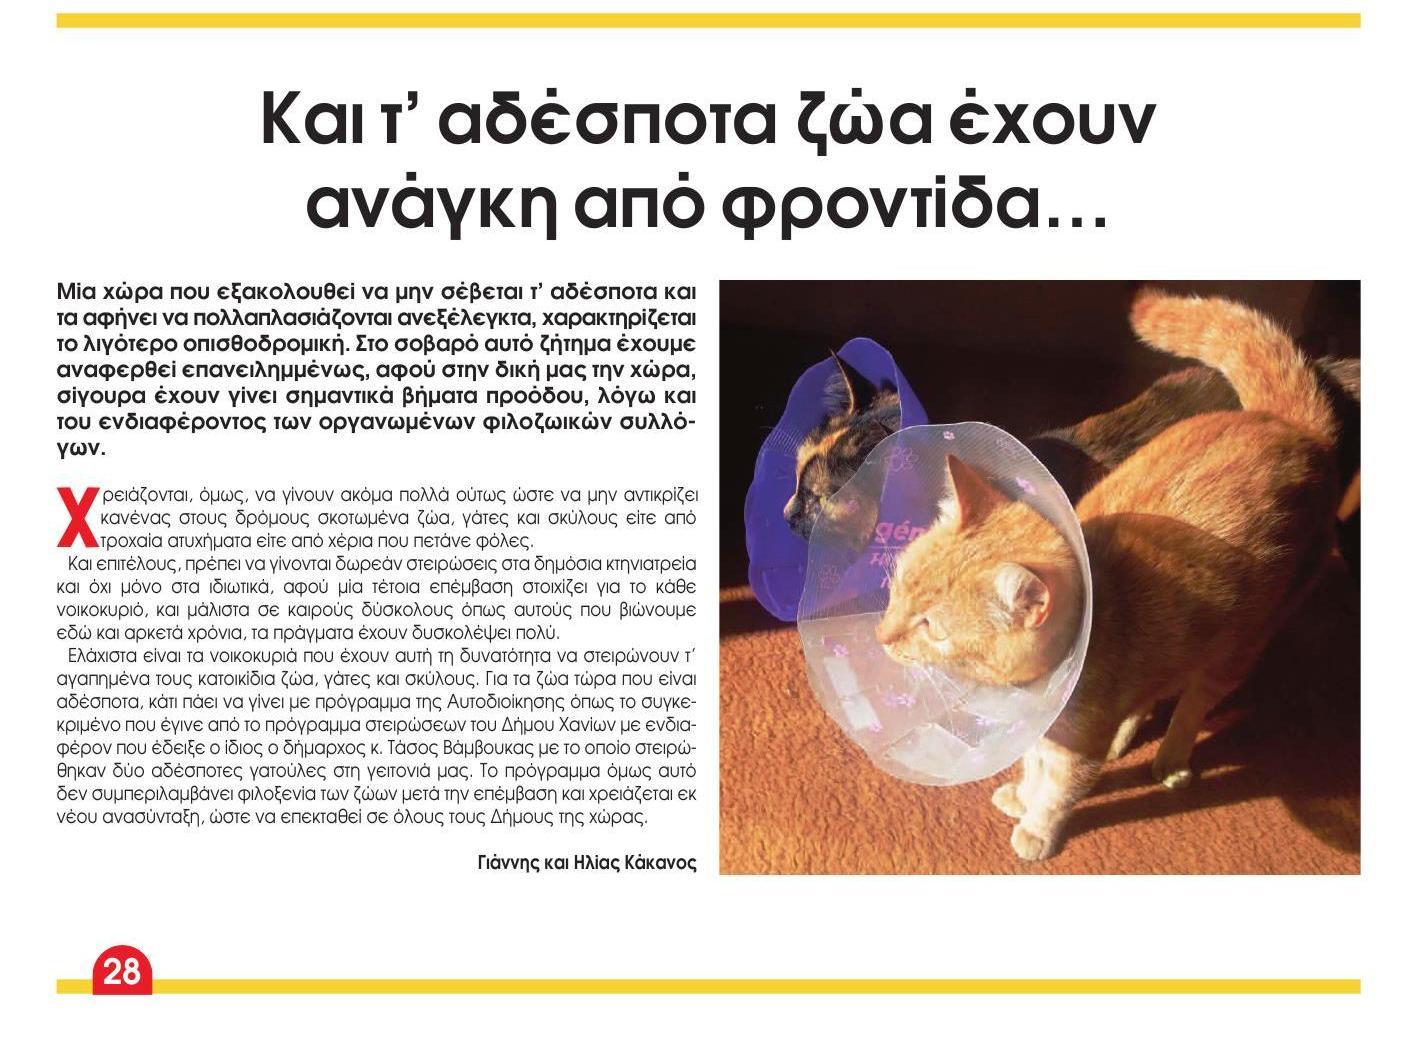 23 KAKANOULHS (Page 28)